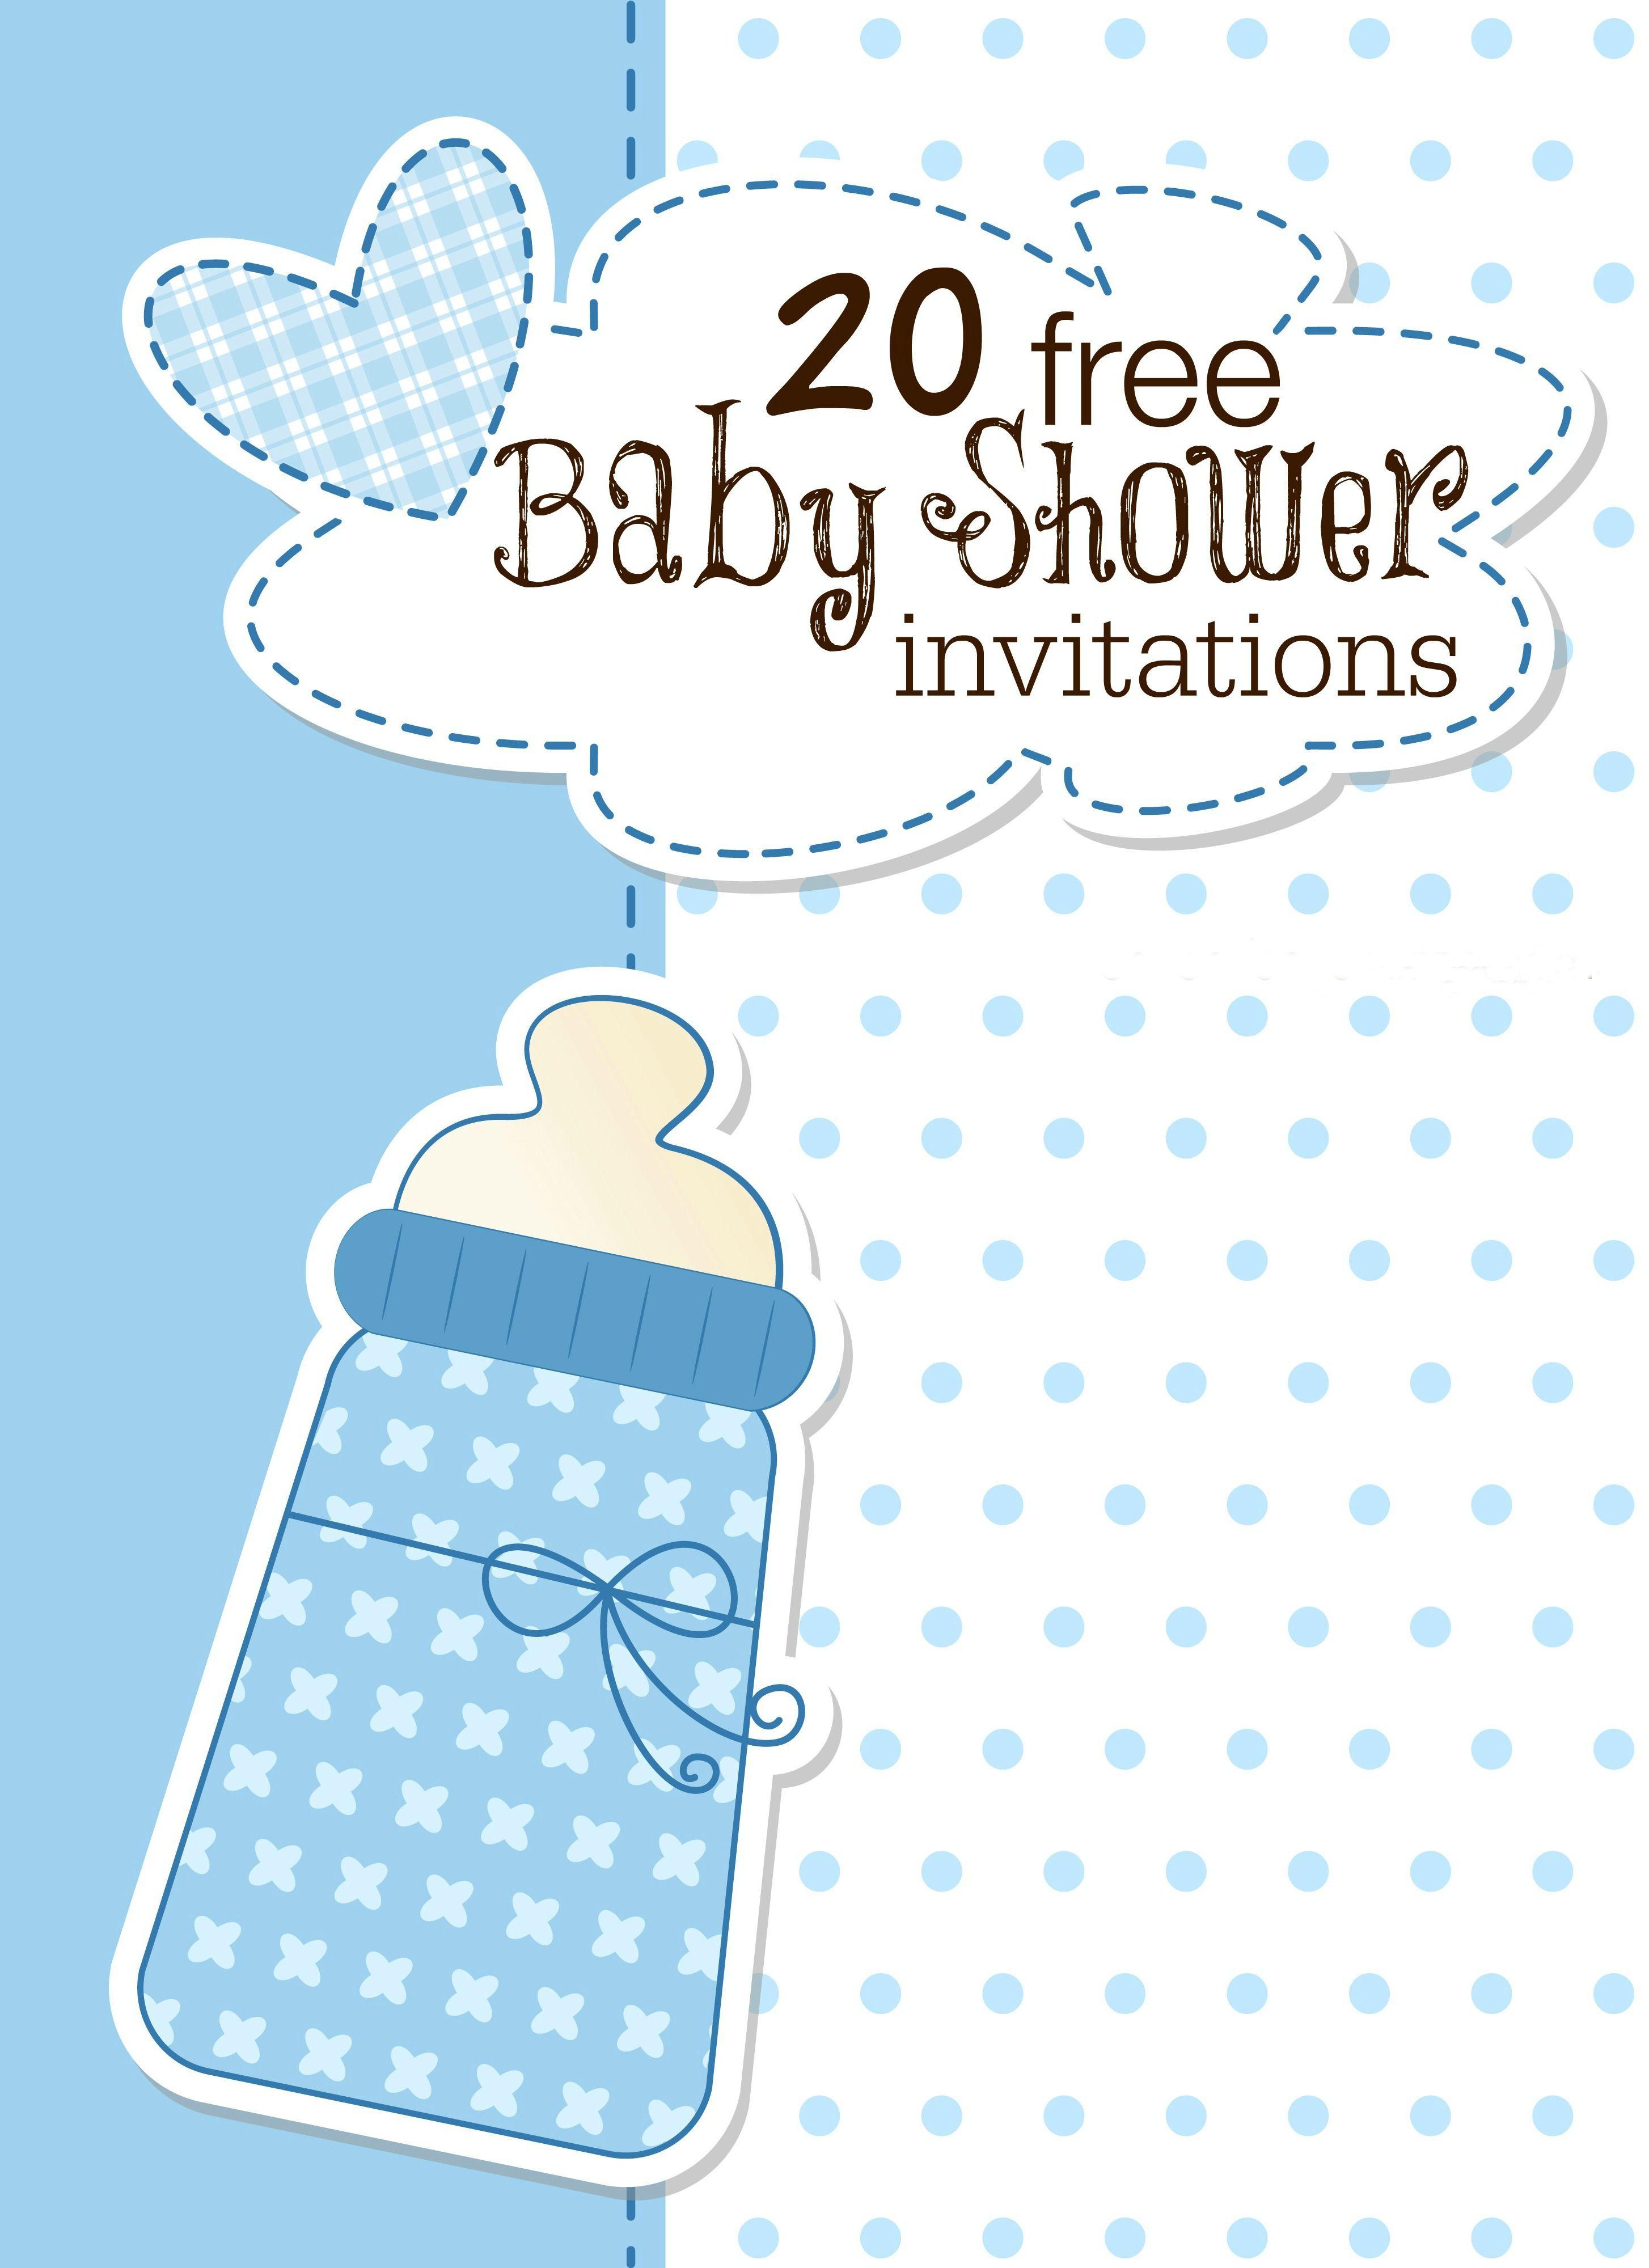 Baby Shower Invitation Free Baby Shower Invitation Template  Invitations